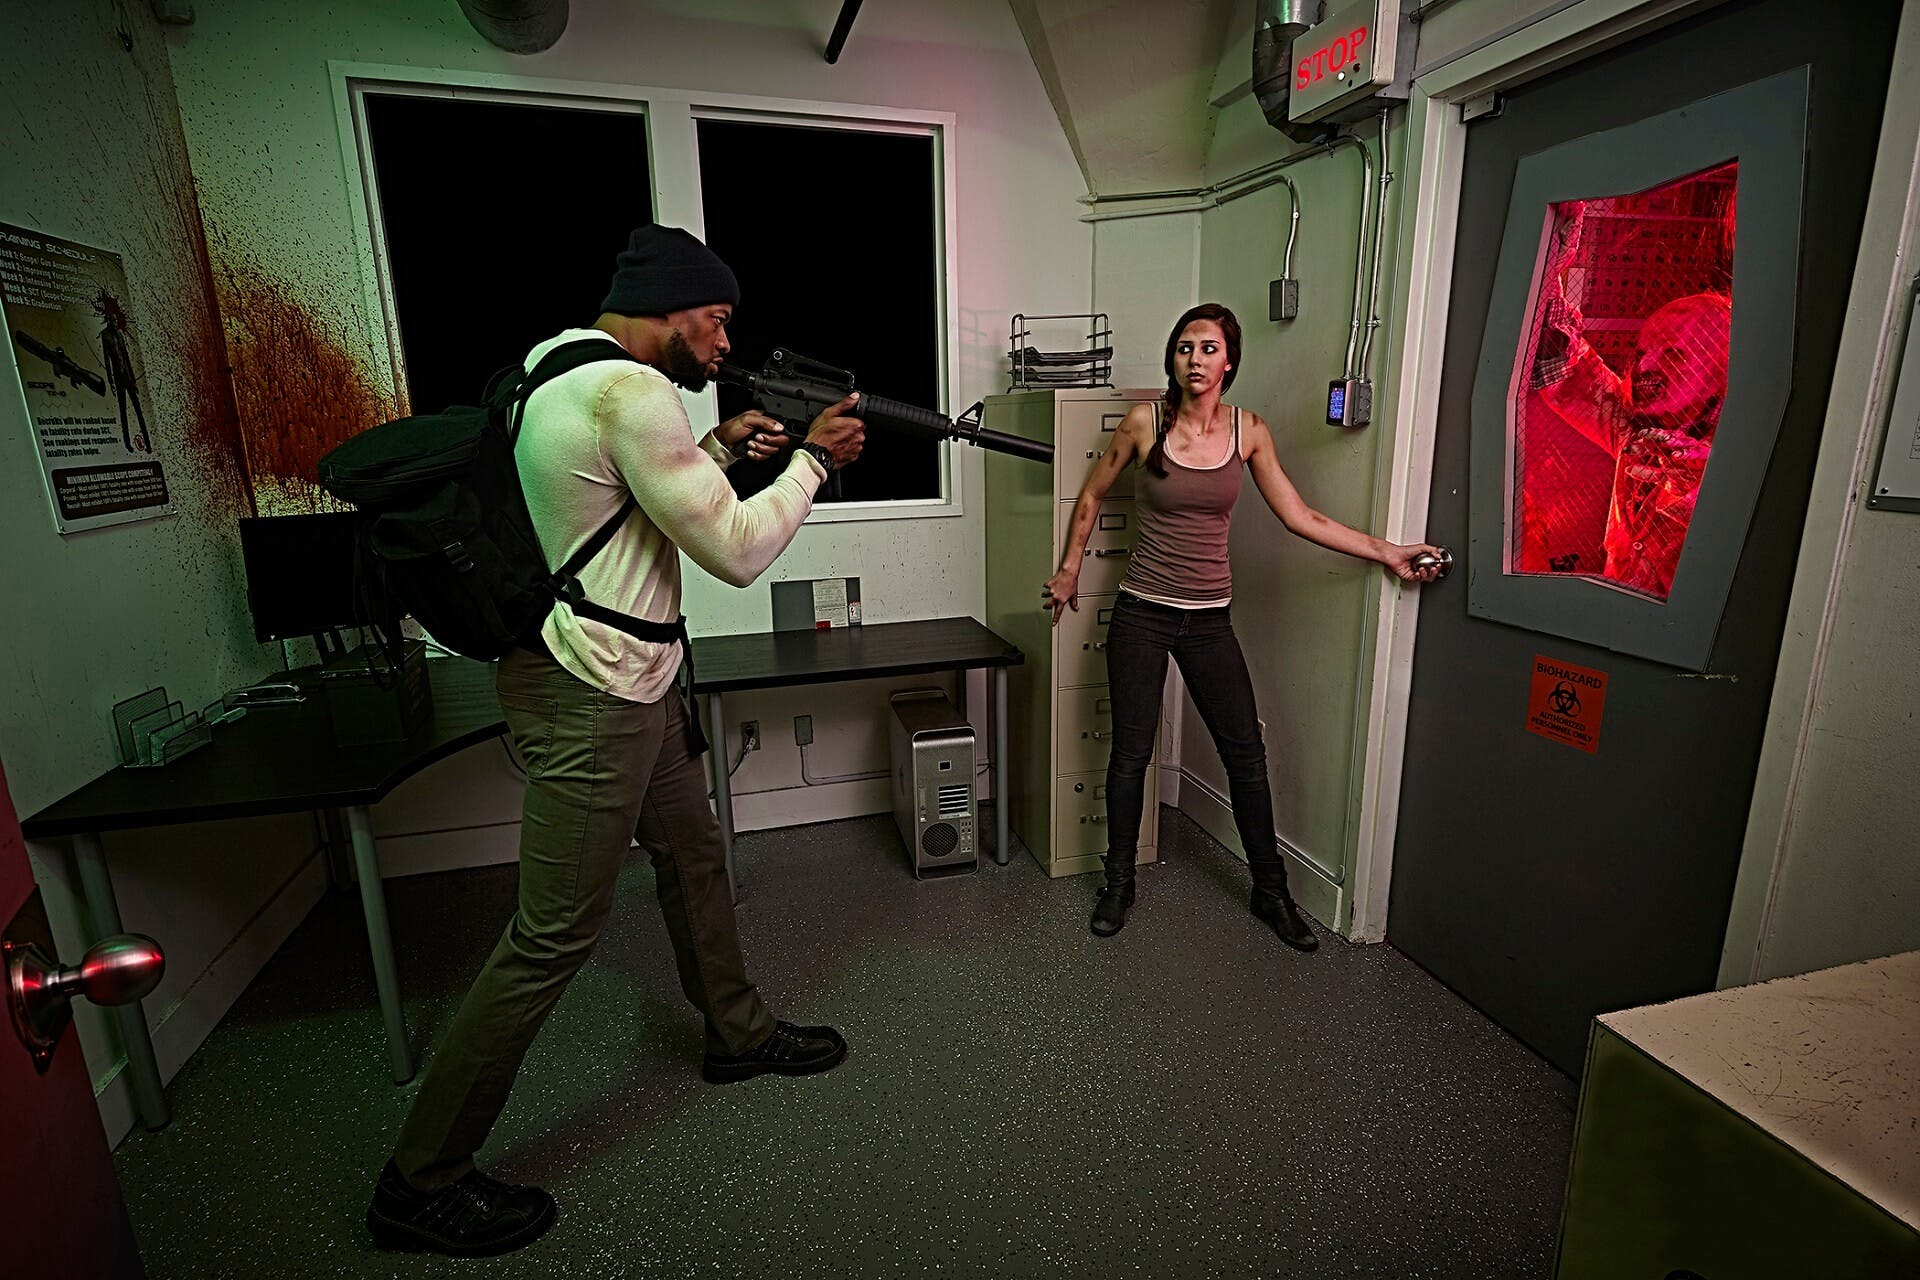 Zombie Apocalypse Escape Room Build Suspenseful Thriller